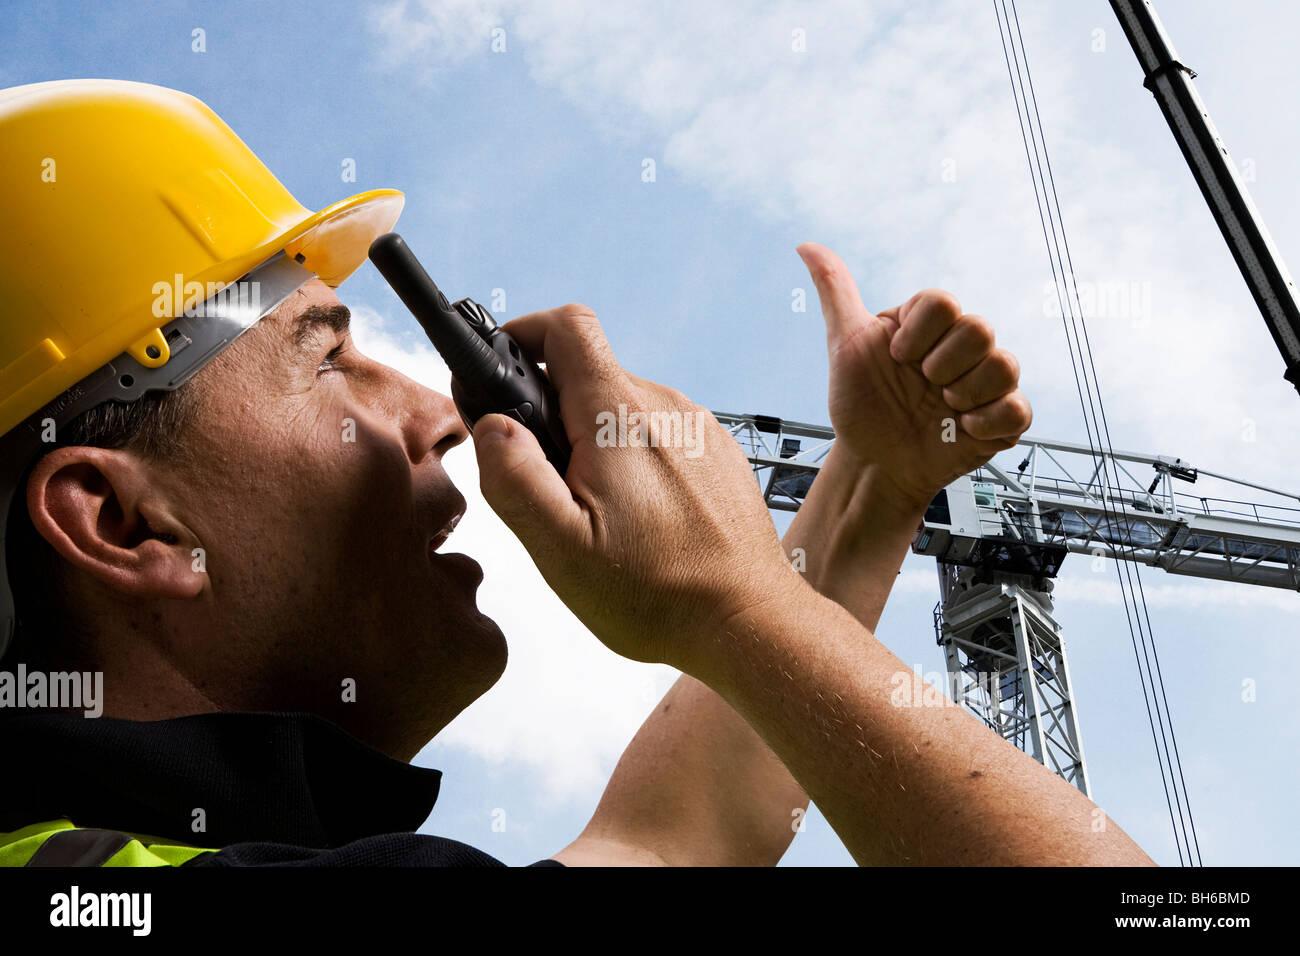 Construction worker directing crane - Stock Image